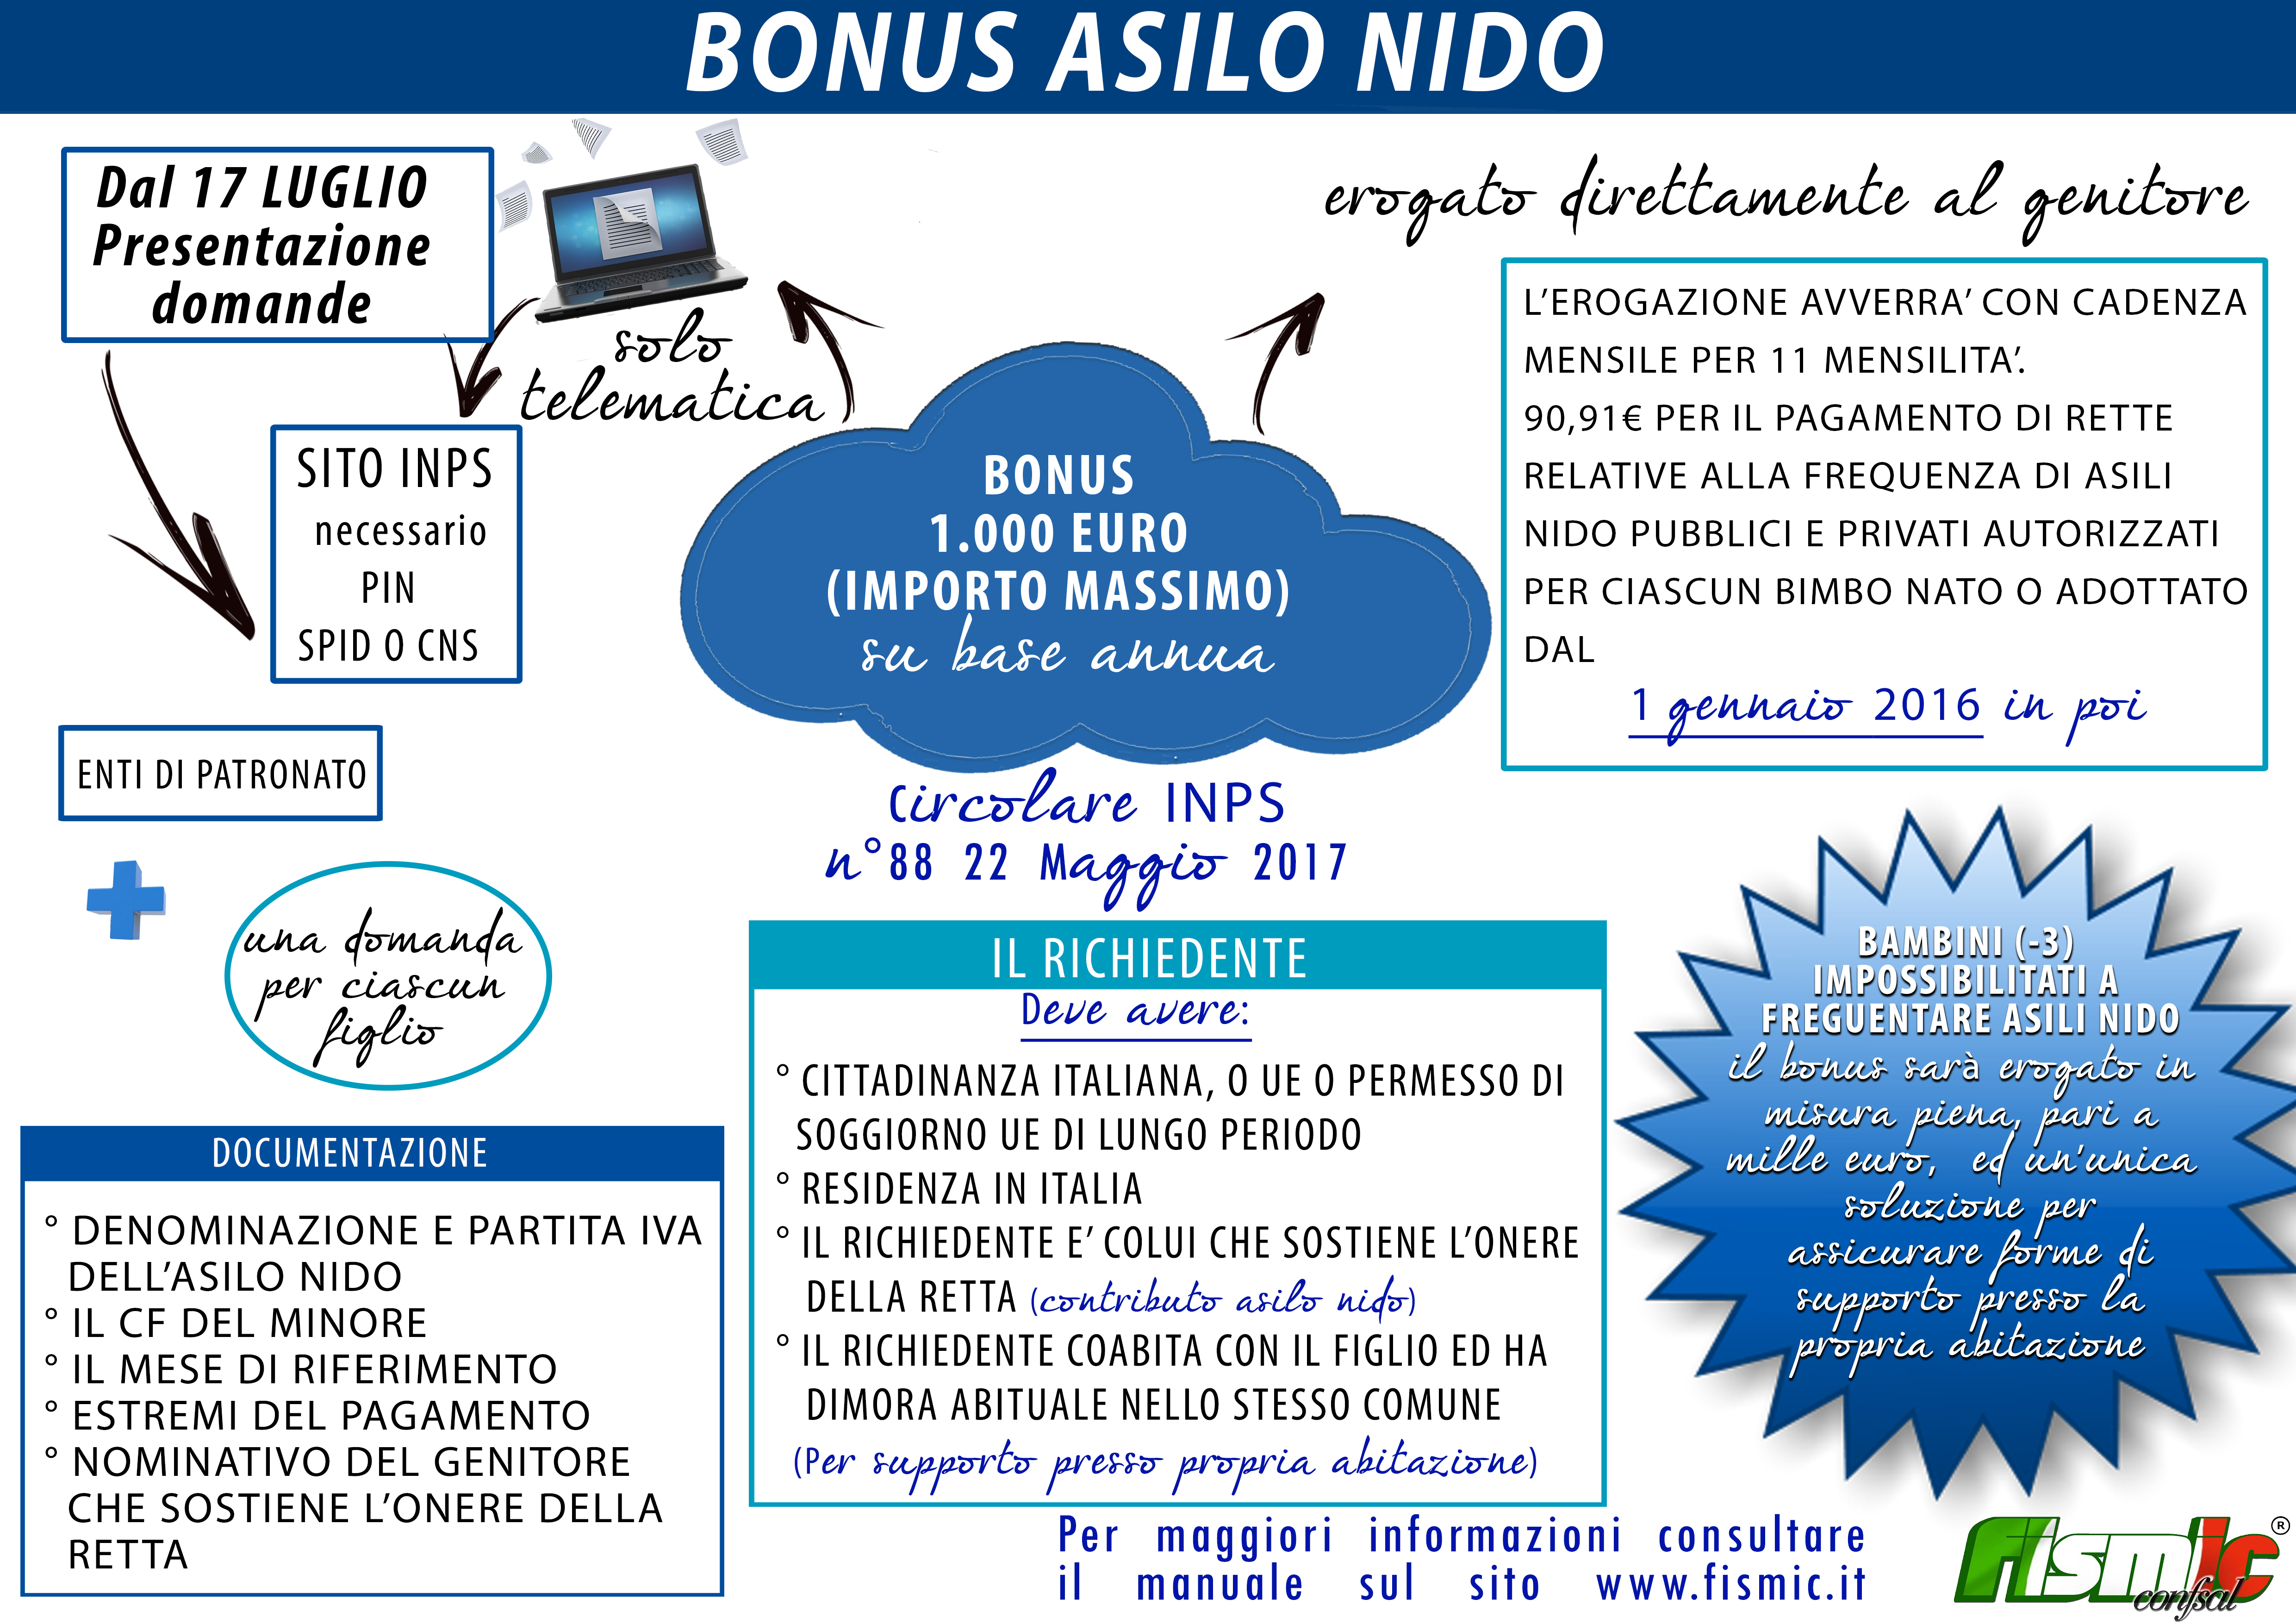 Bonus asilo nido circ 88 2017 fismic for Bonus asilo nido 2019 requisiti